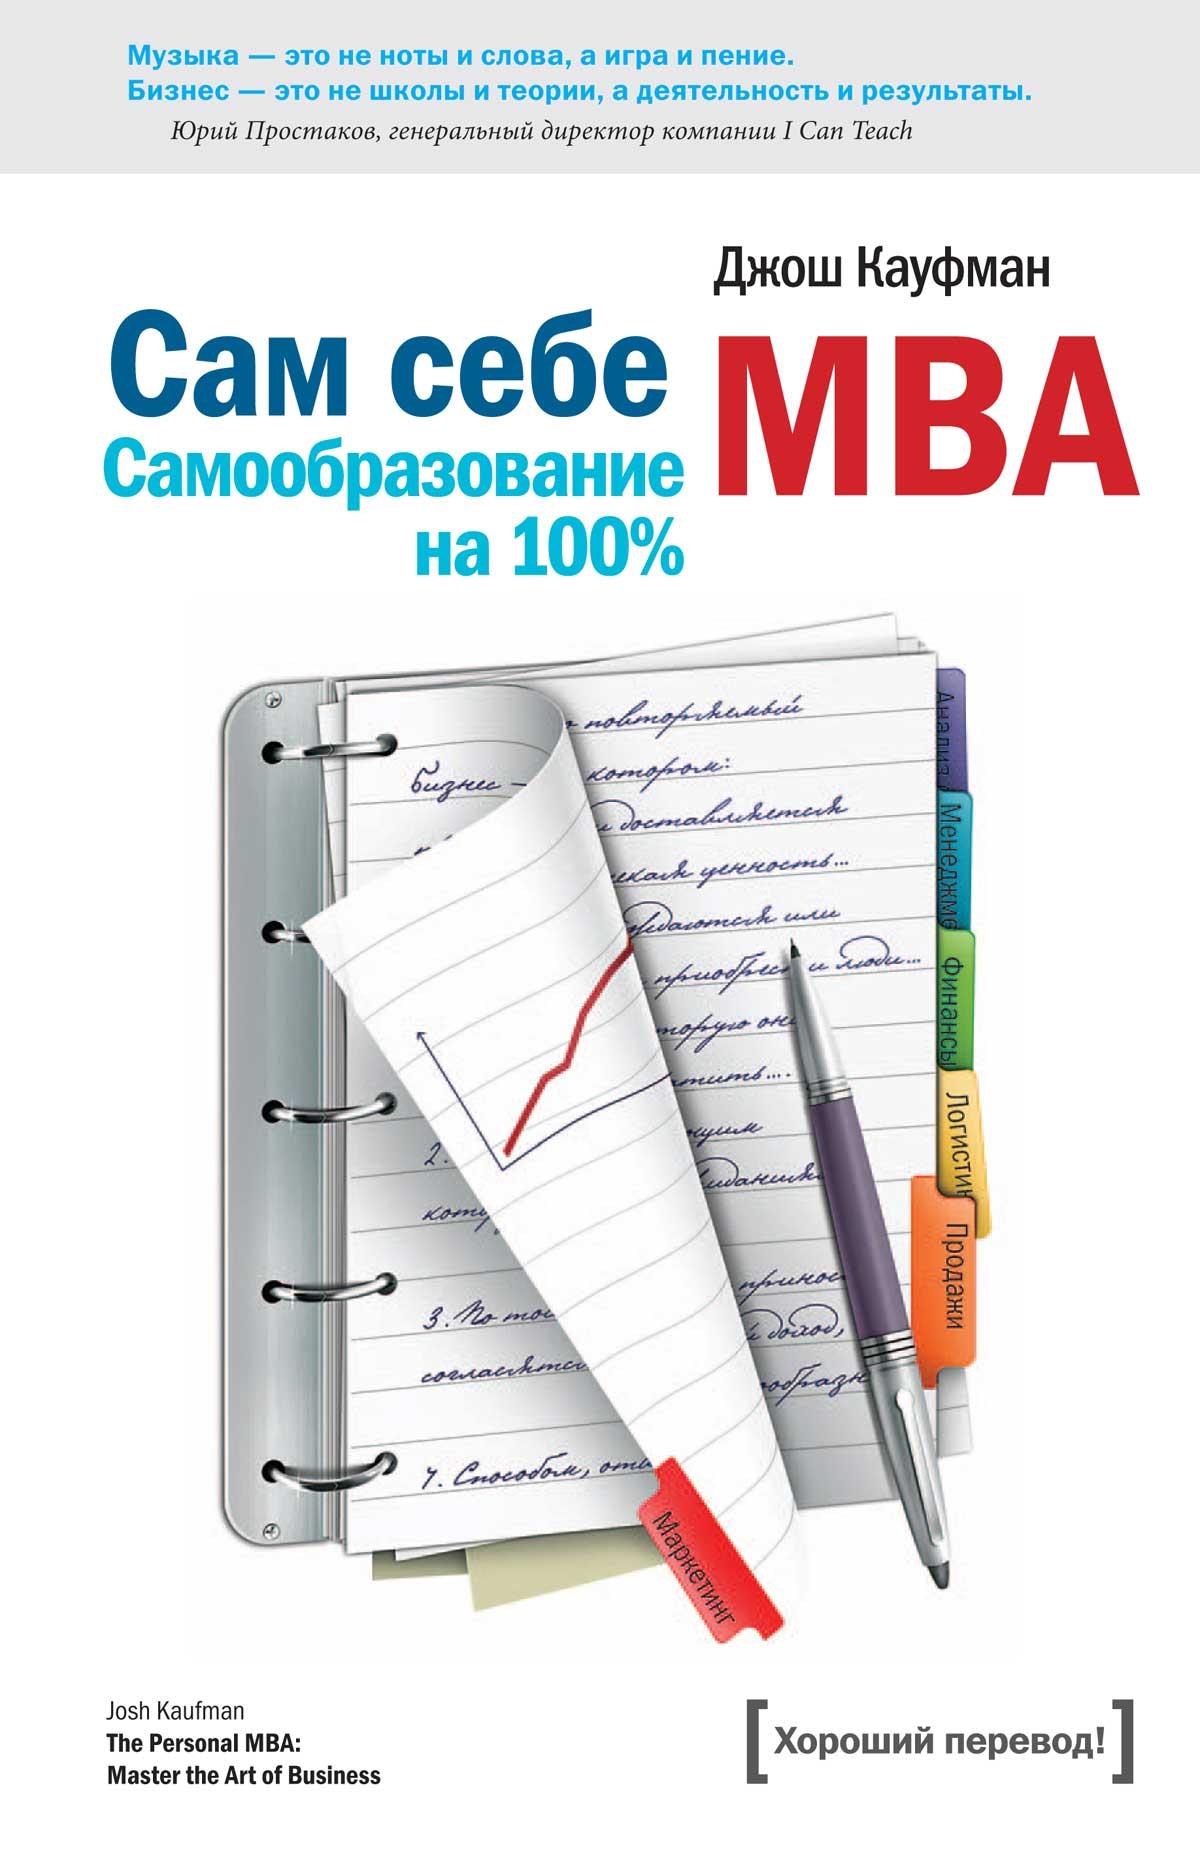 Сам себе MBA. (Самообразование на 100% )